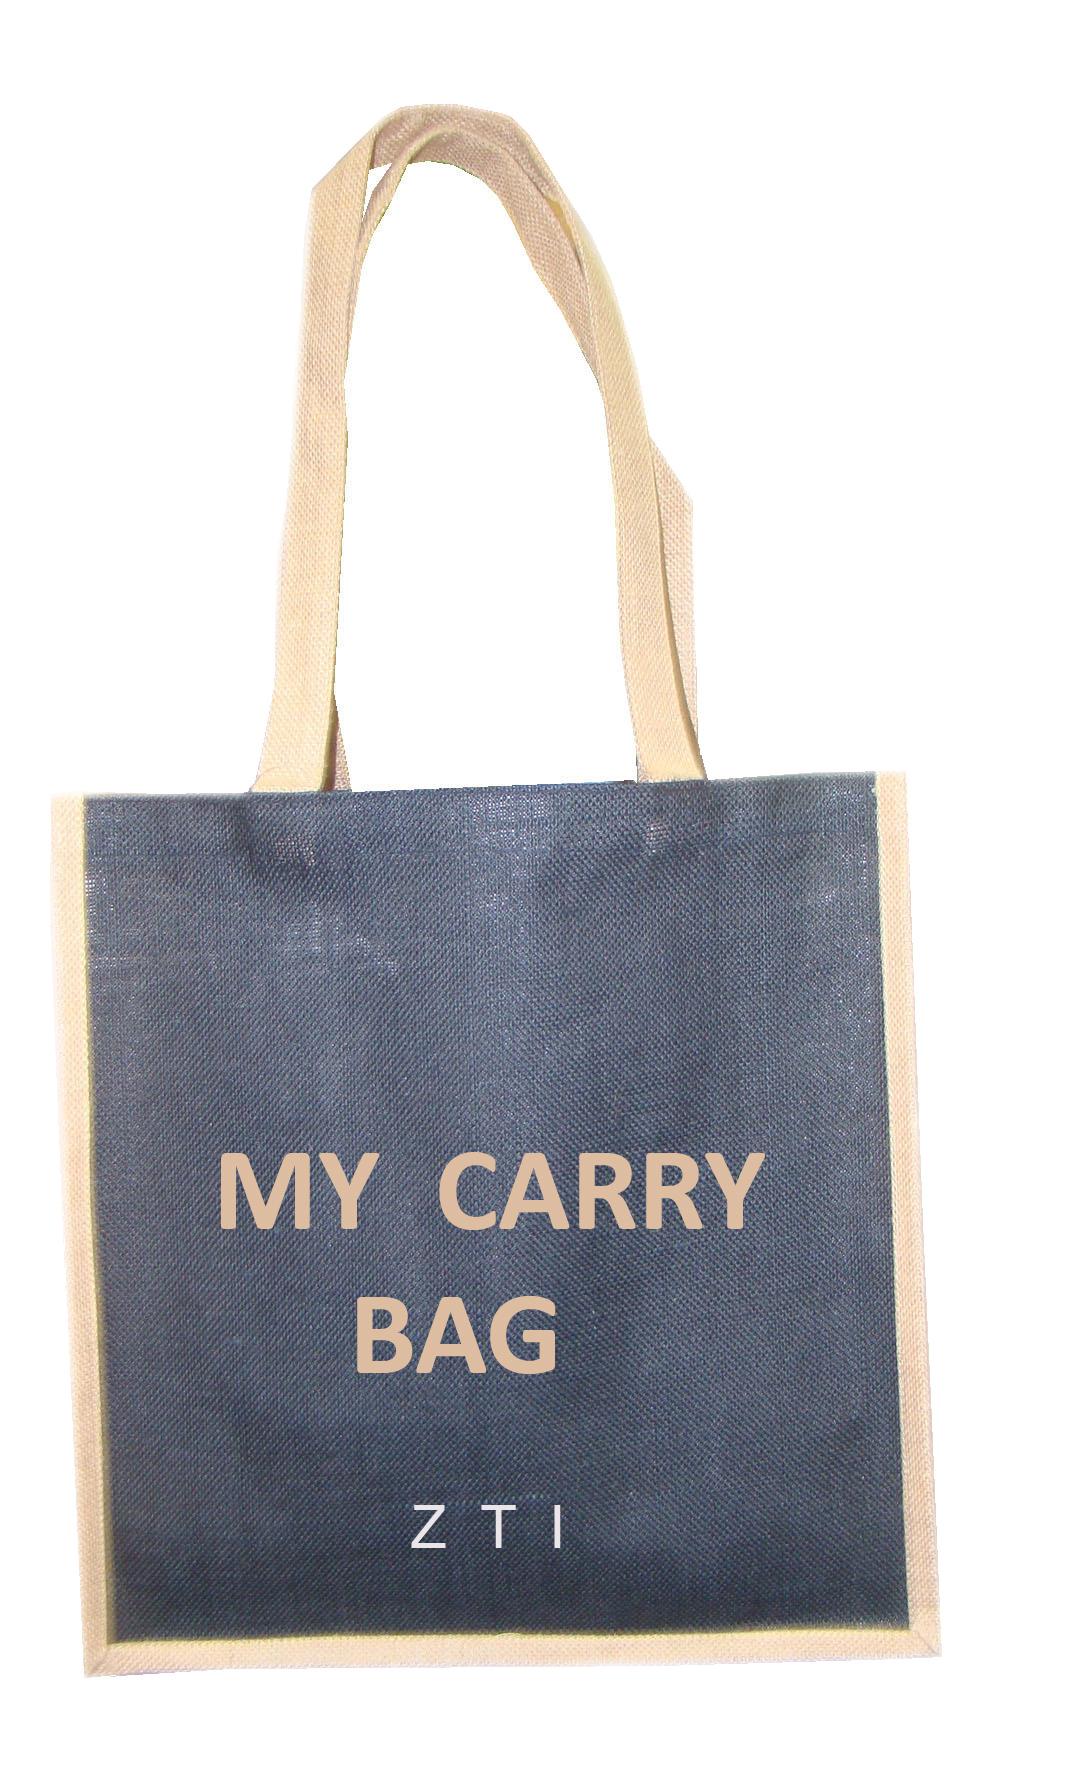 Zesttex Promotional Jute Bags